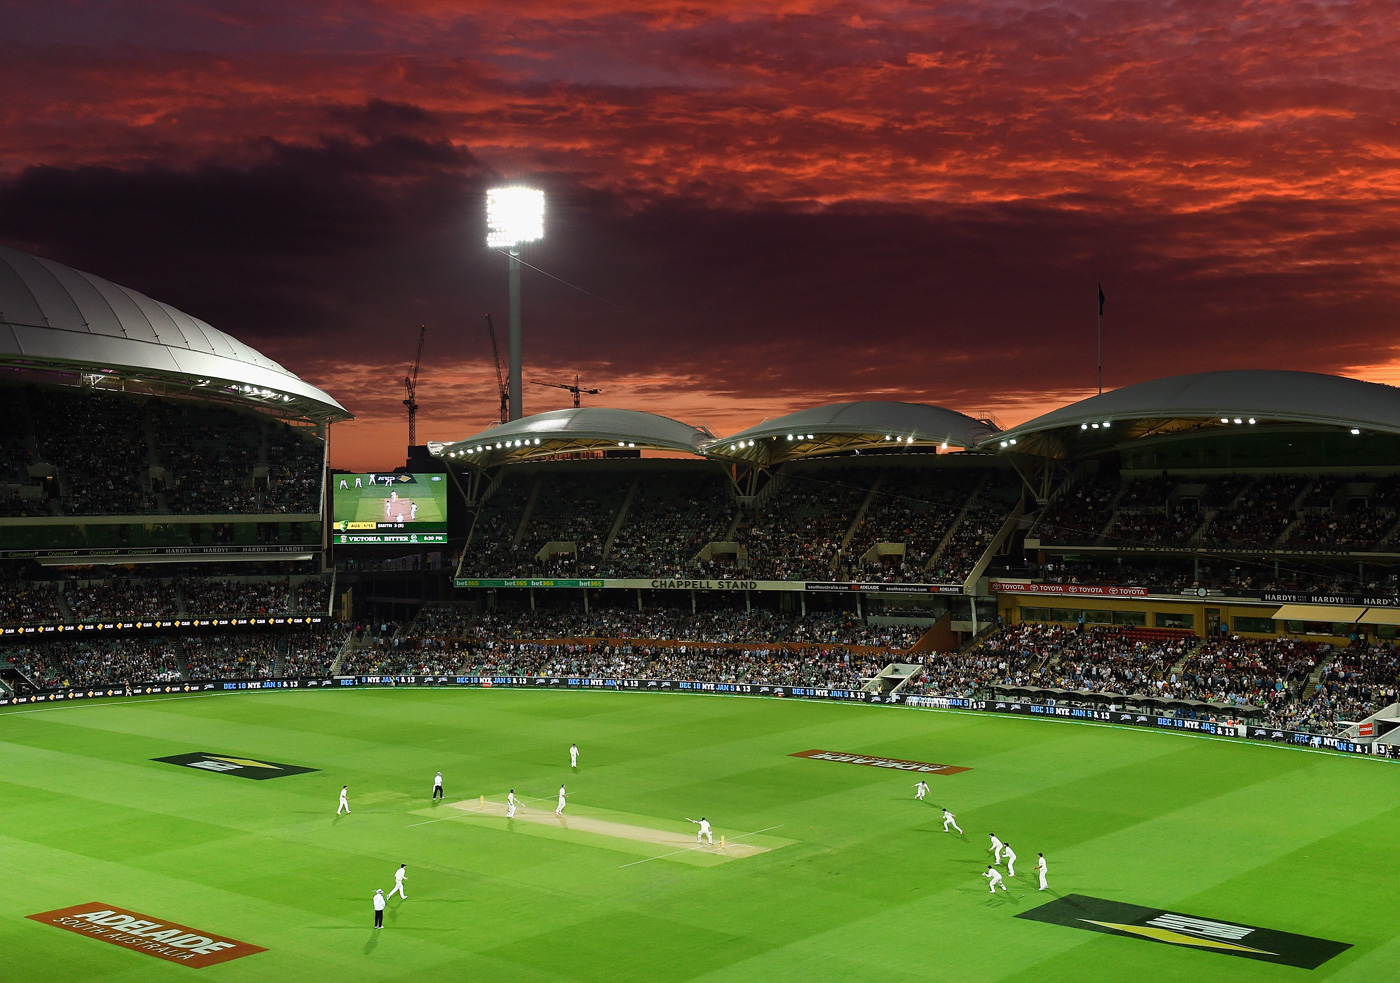 Sunset boulevard: a nocturnal future beckons for Test cricket